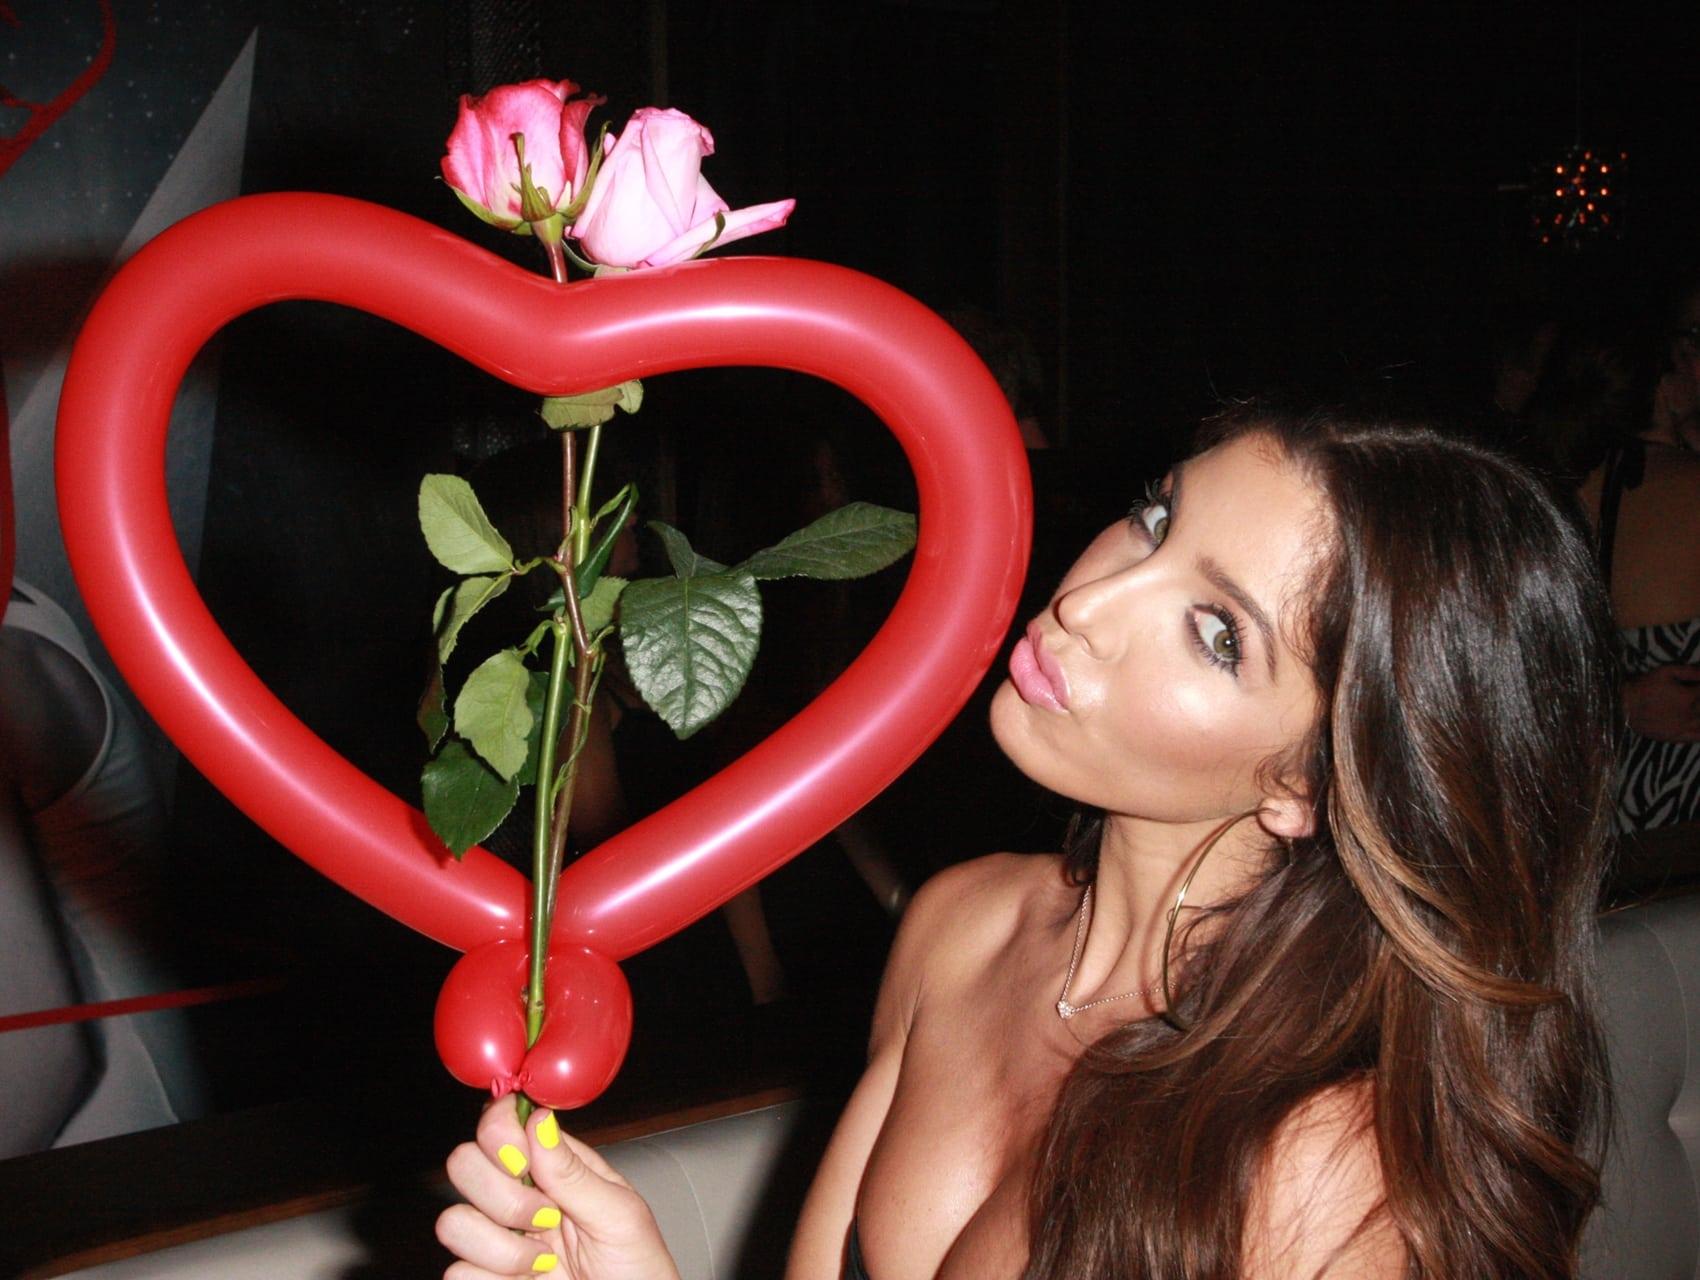 Kim Kardashian's lookalike Melissa Molinaro